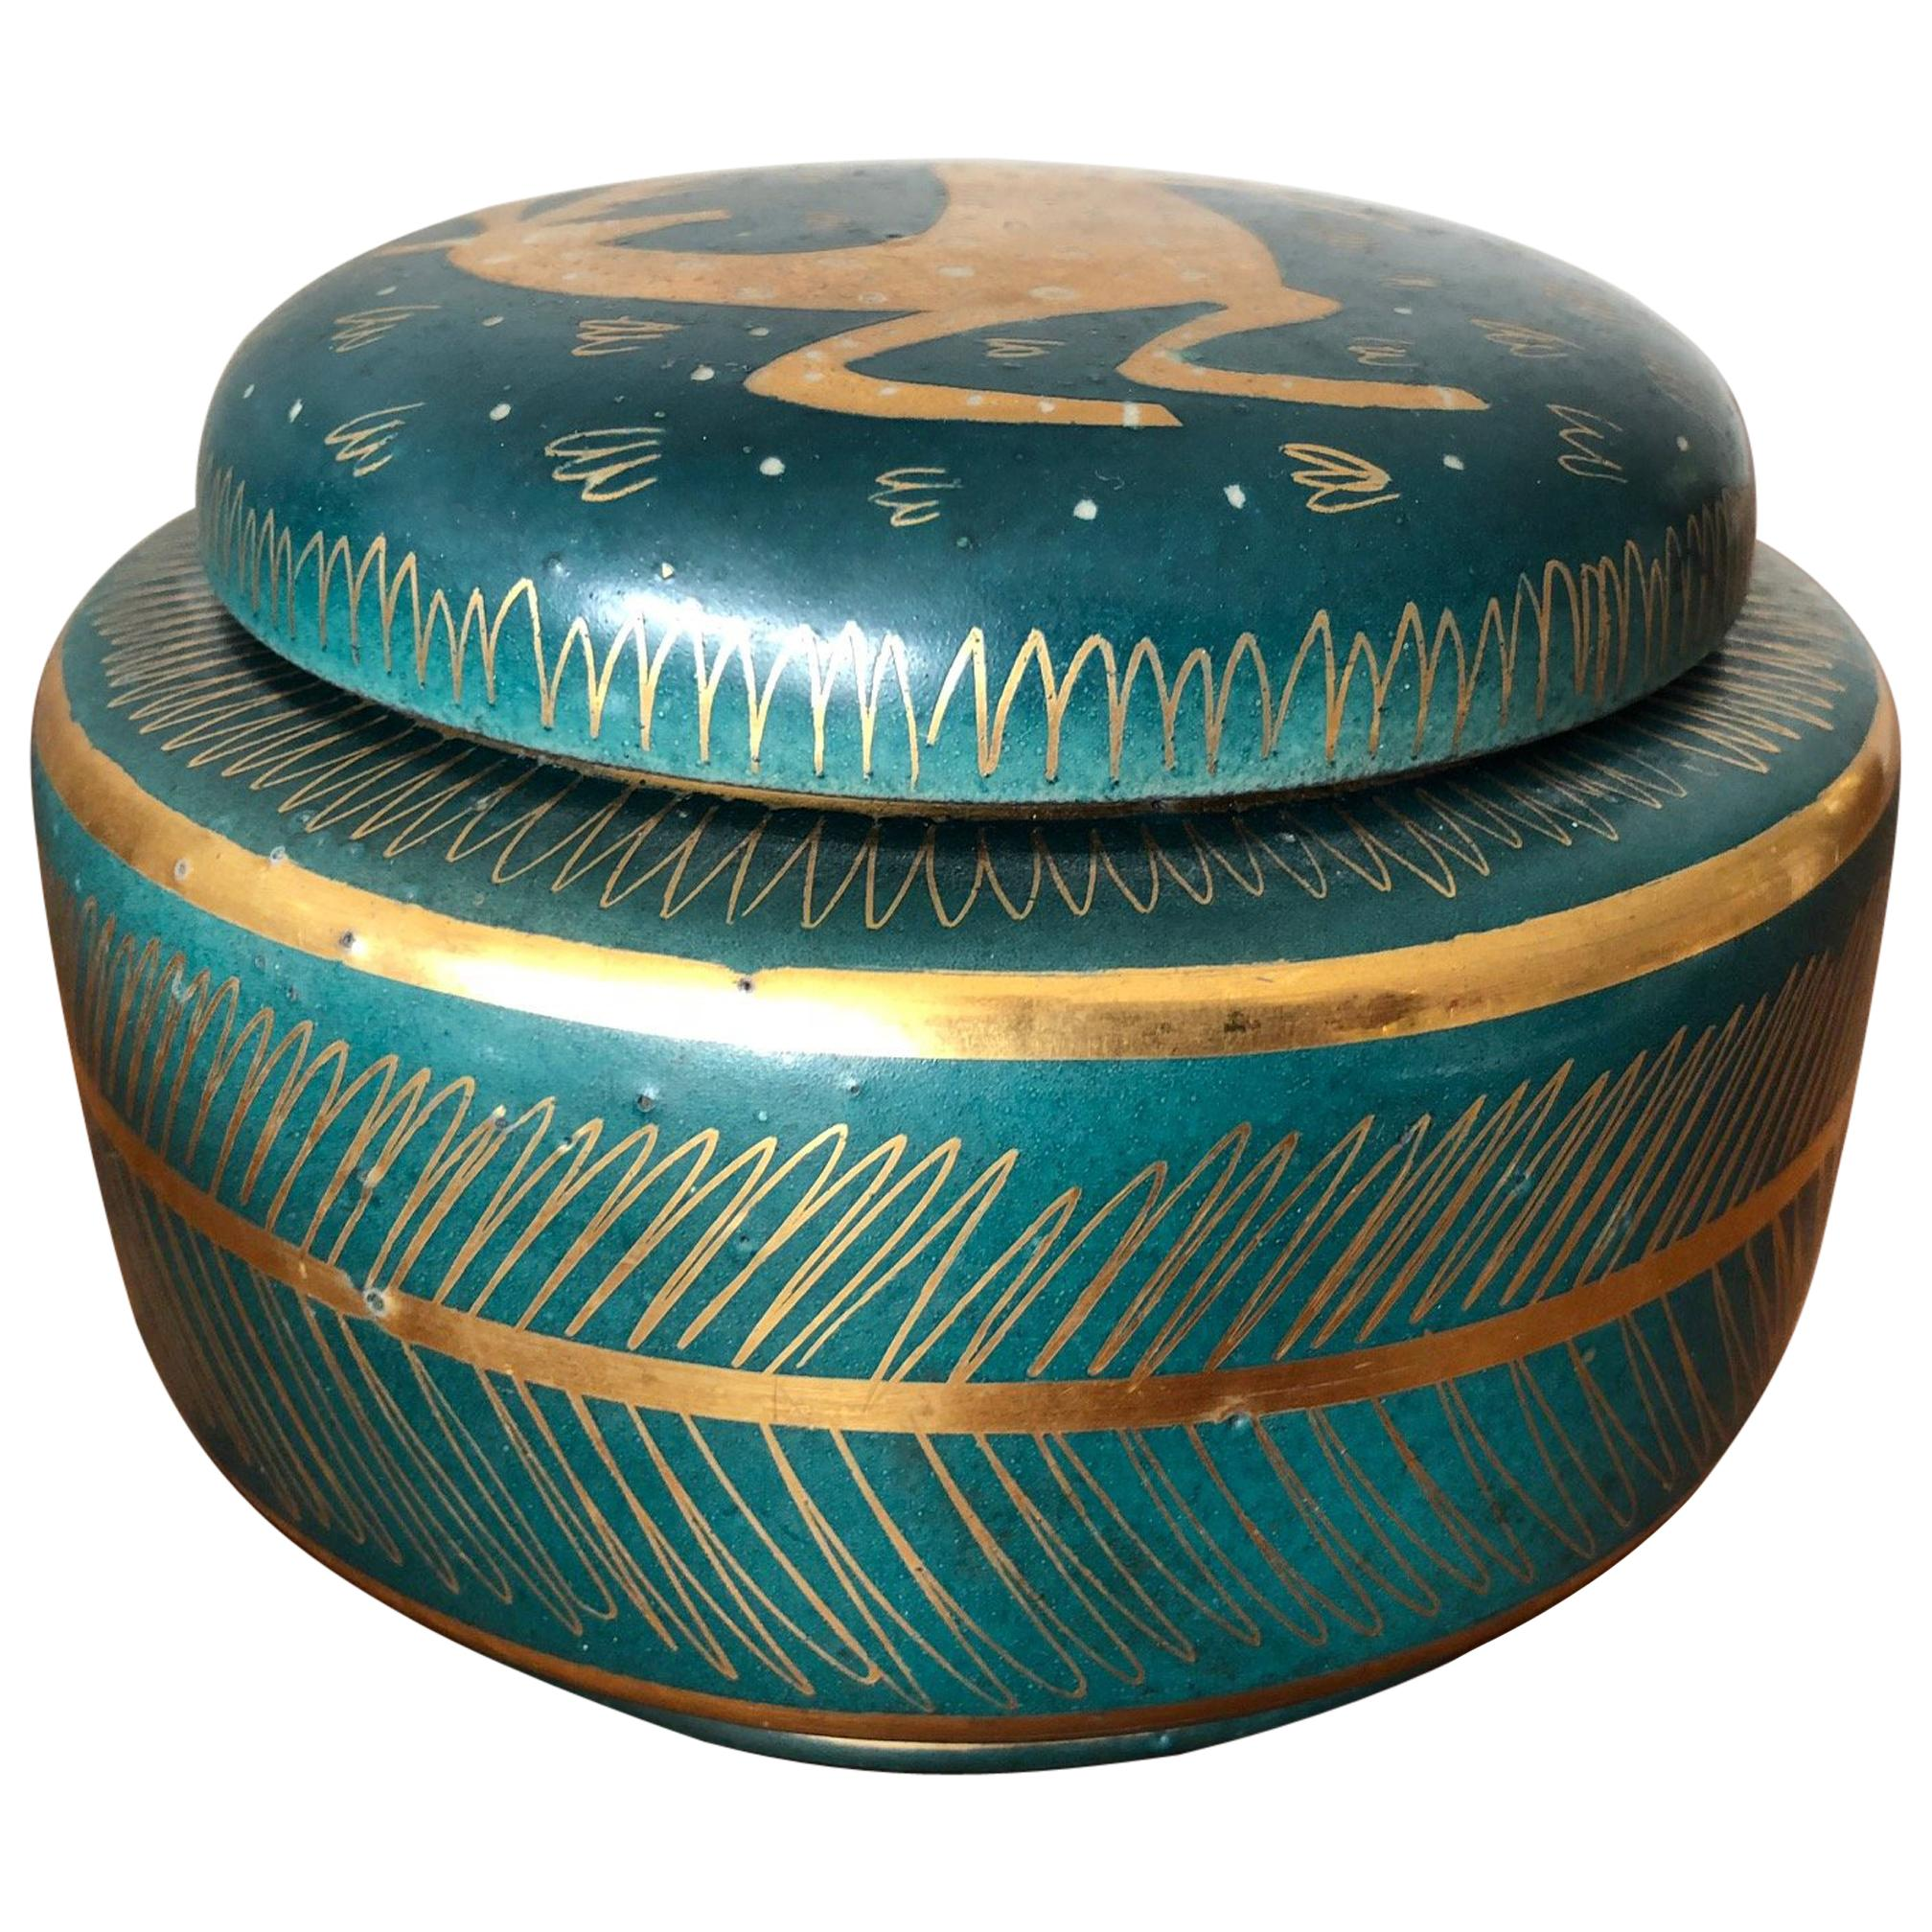 Waylande Gregory Ceramic Jar with Sgraffito Decoration